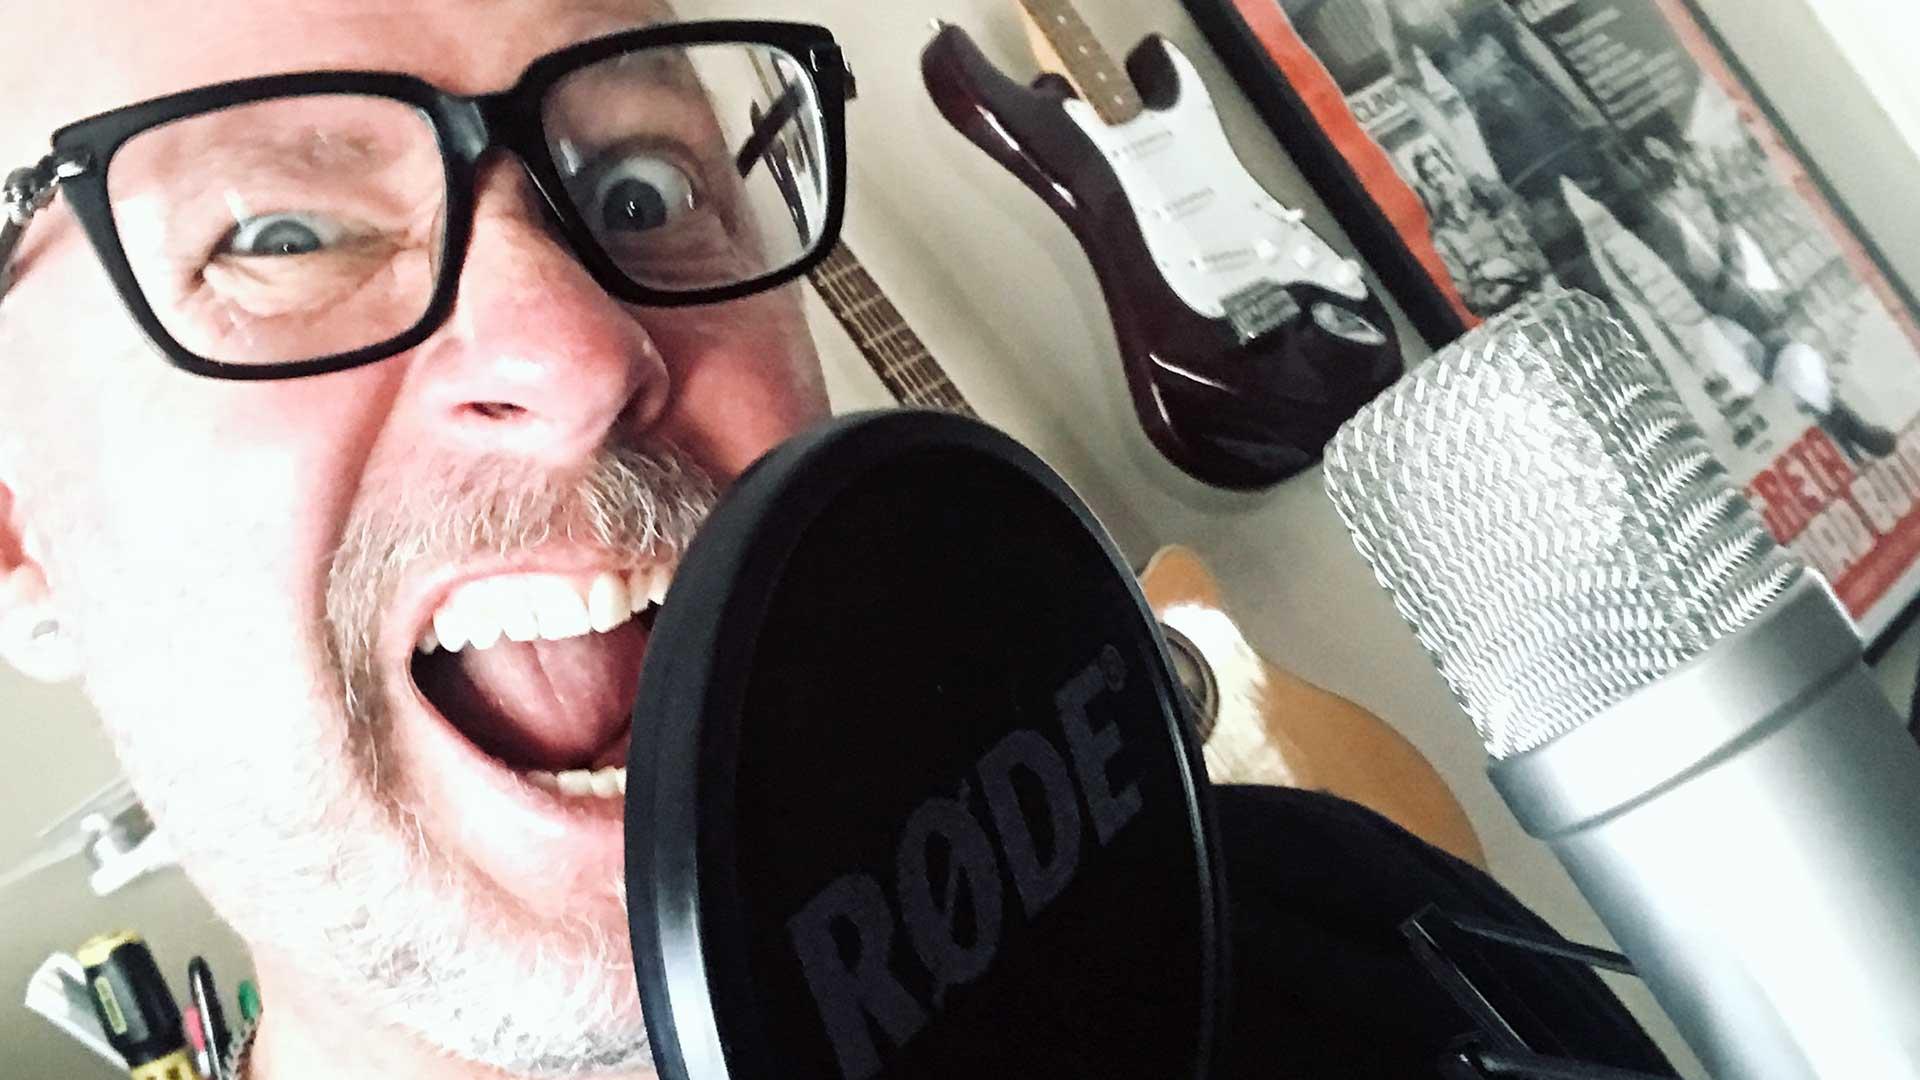 Michael Dargie RebelRebel Podcast